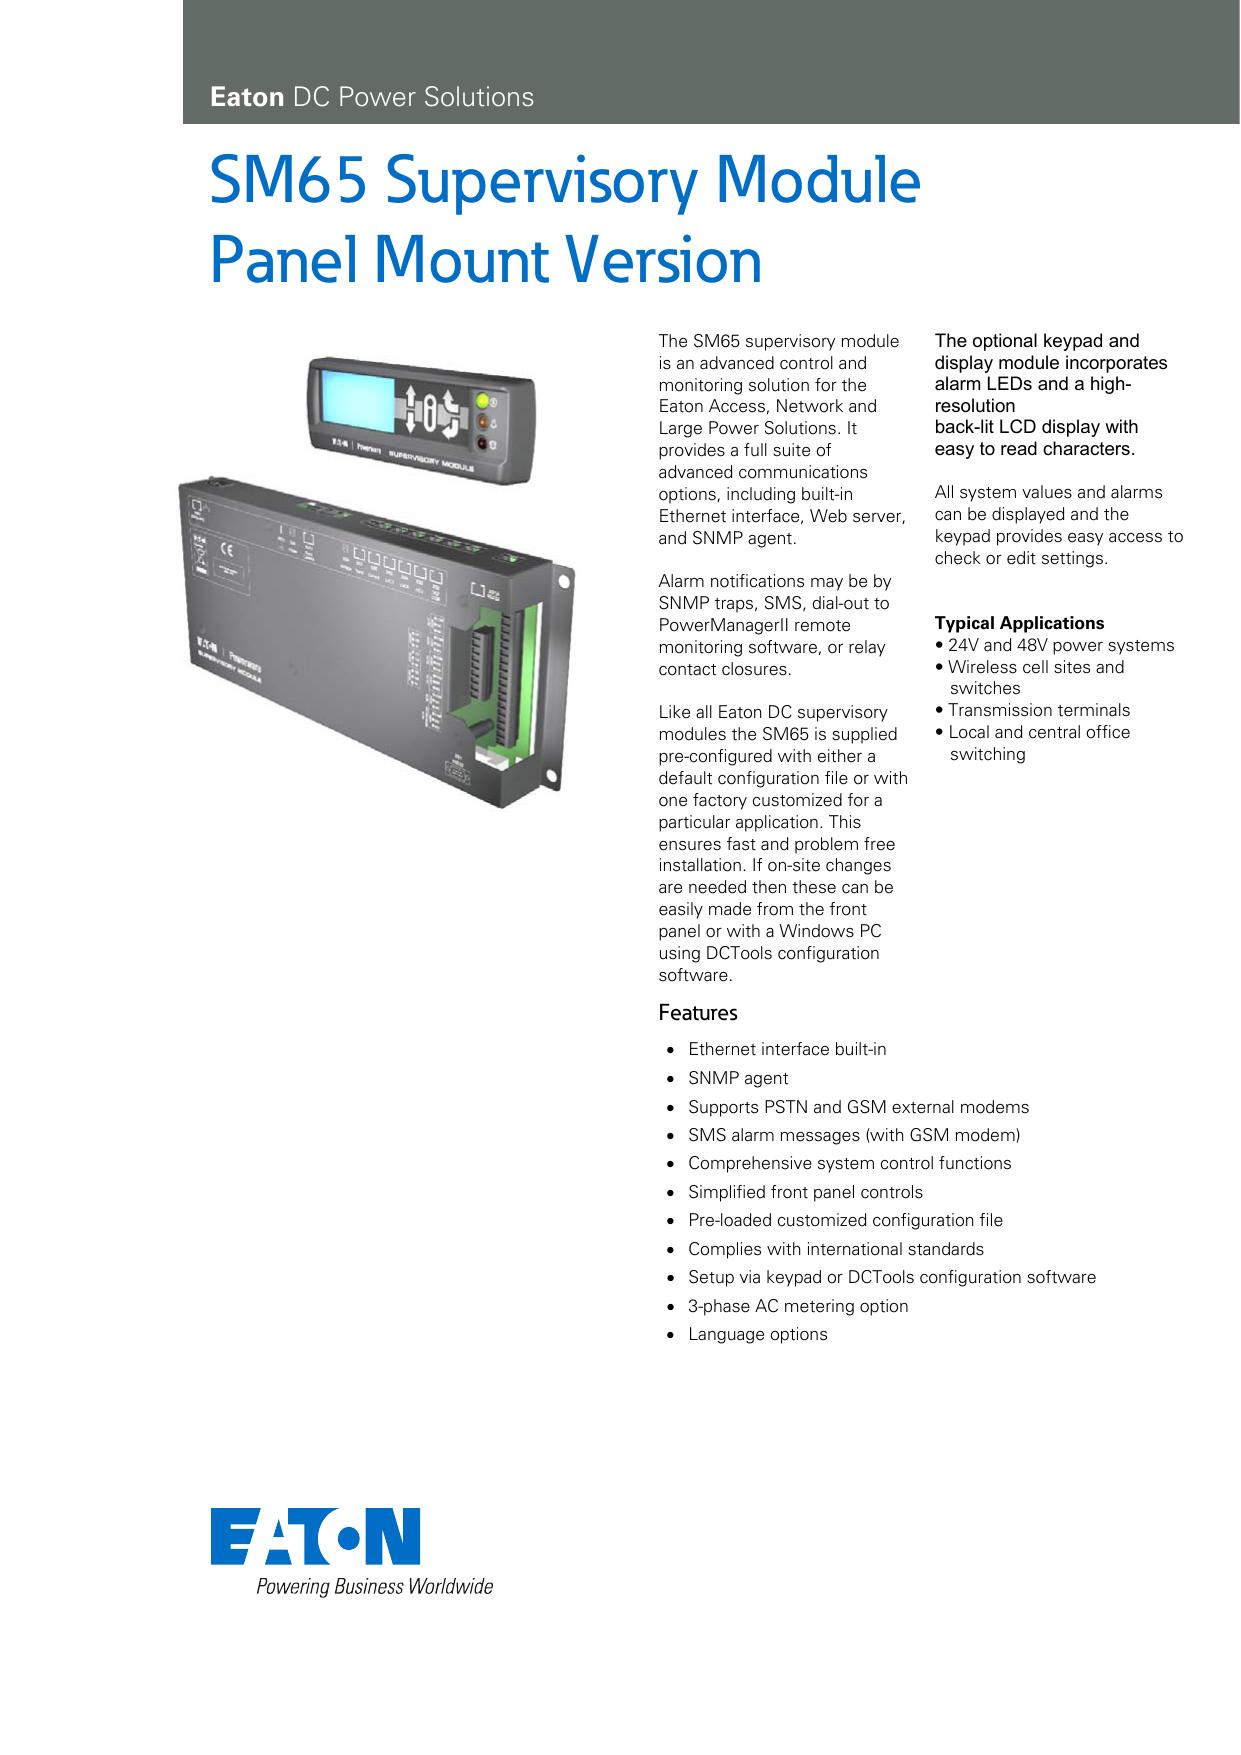 SM65 Supervisory Module Panel Mount Version | manualzz com